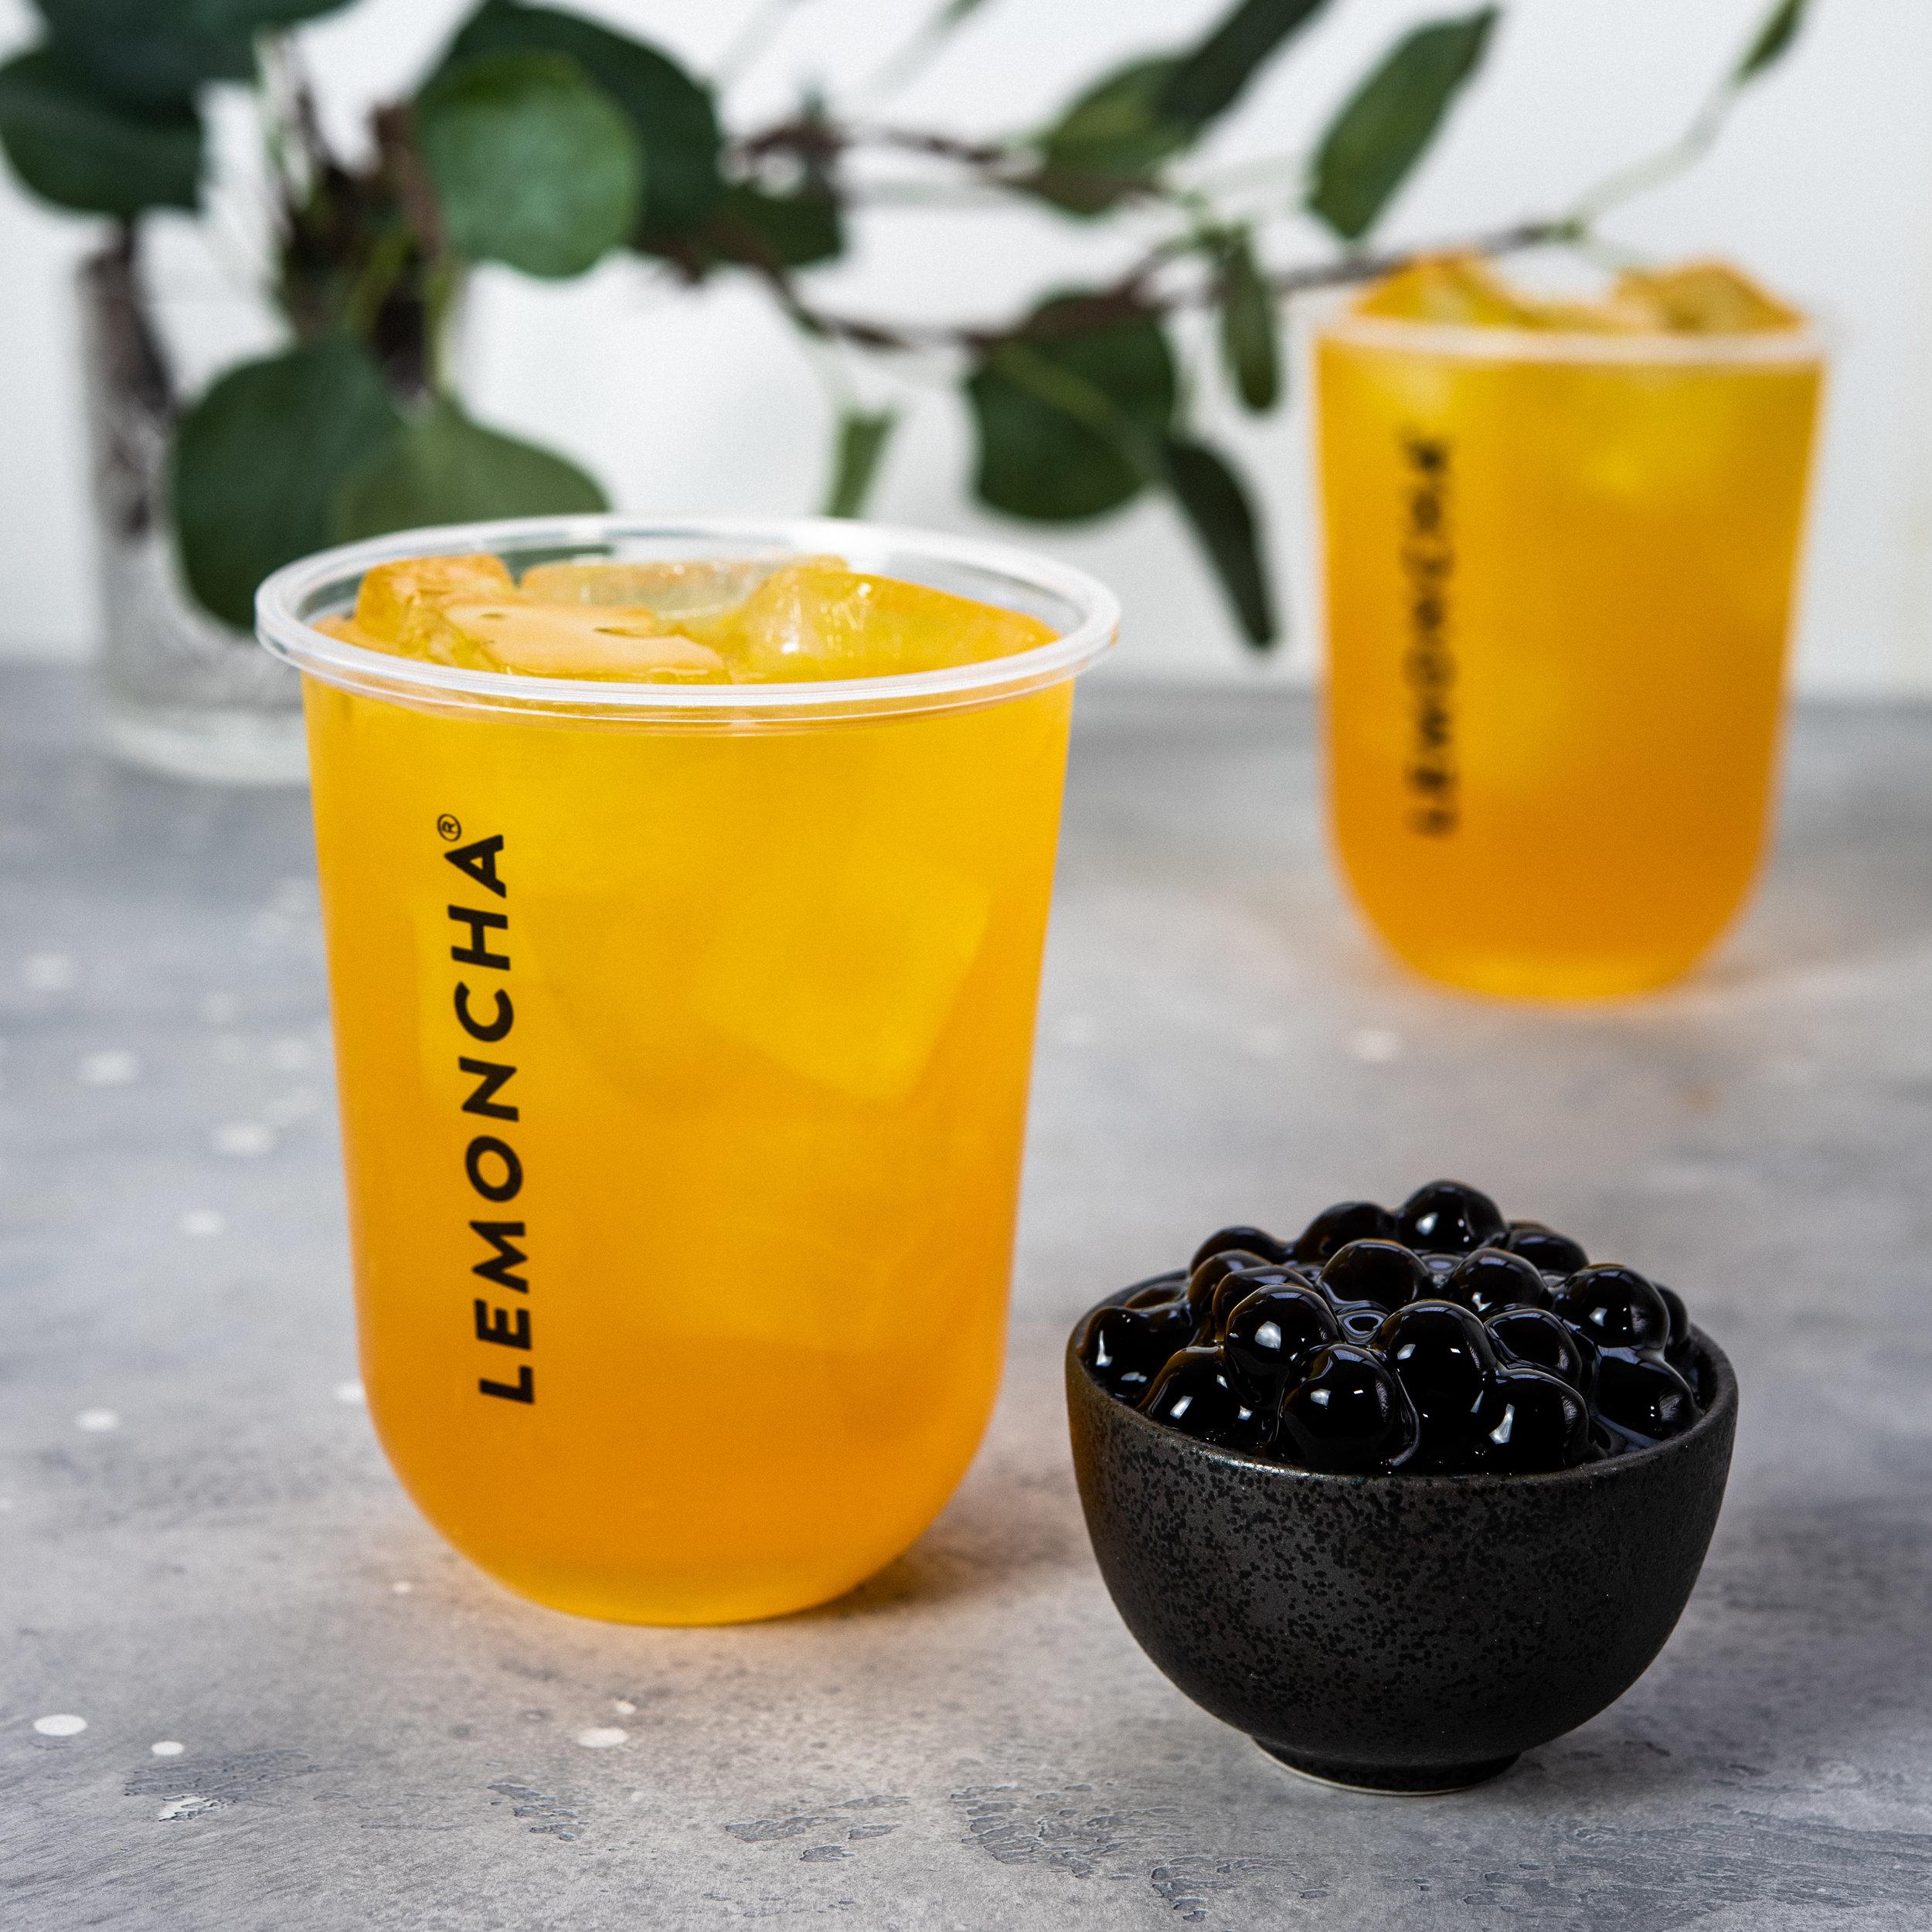 New Lemoncha Pricing Policy